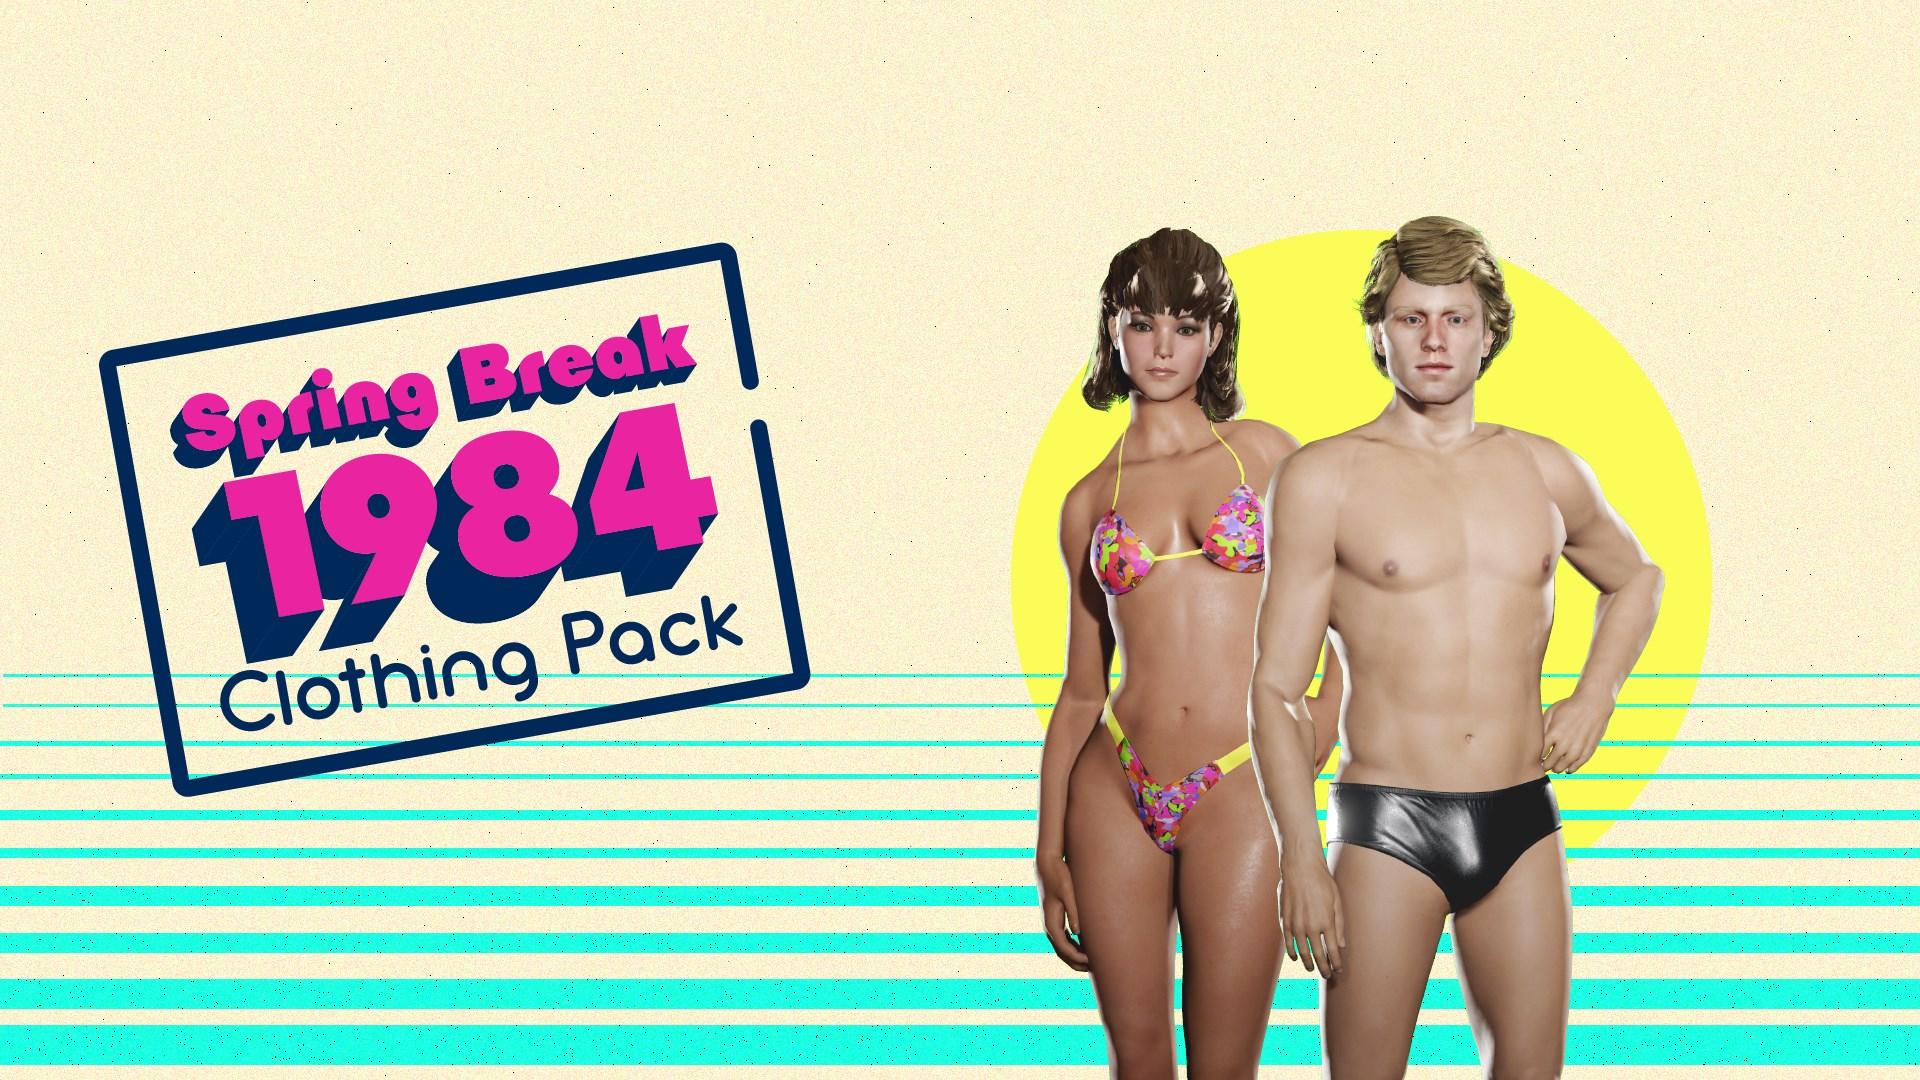 Spring Break '84 Clothing Pack